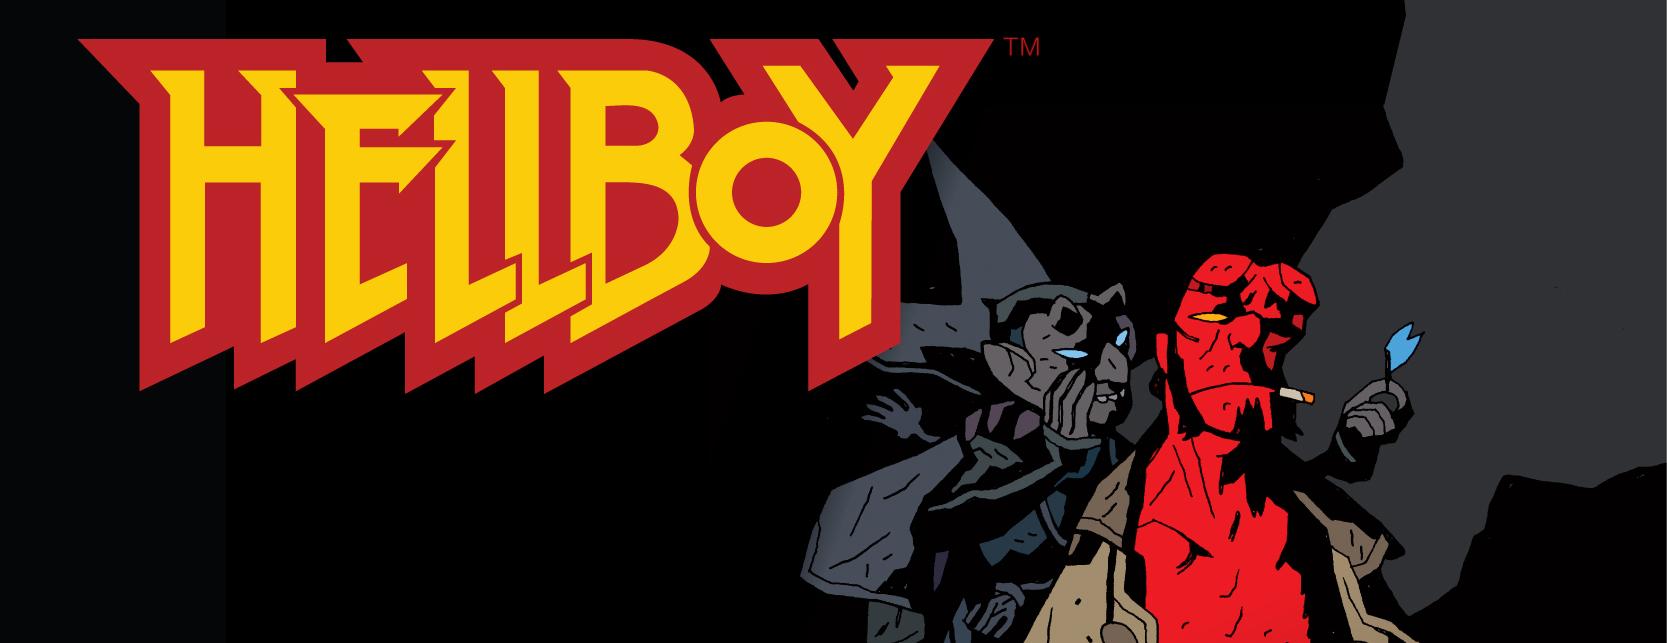 super7-hellboy-figures